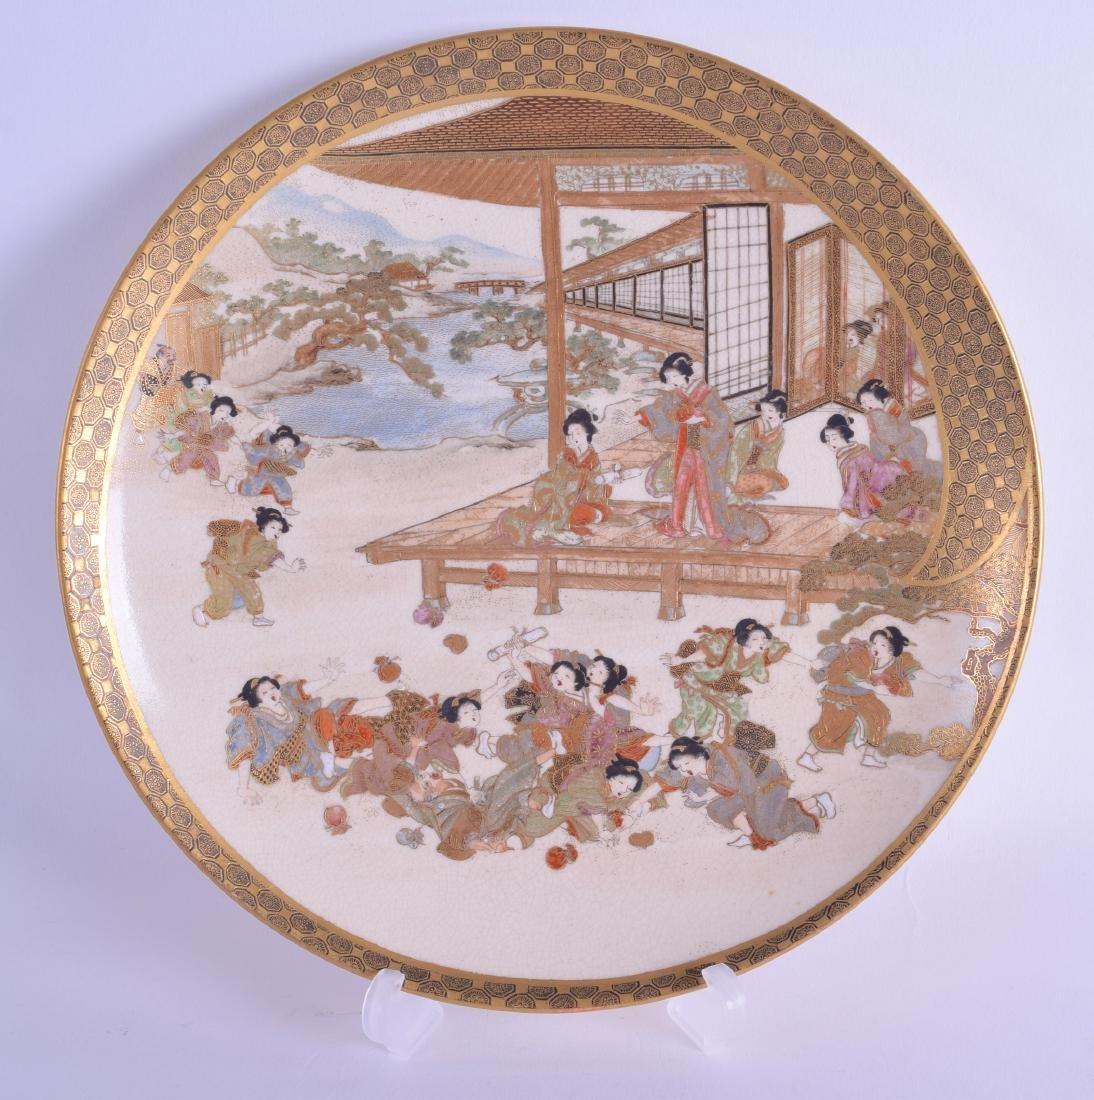 A 19TH CENTURY JAPANESE MEIJI PERIOD SATSUMA CIRCULAR